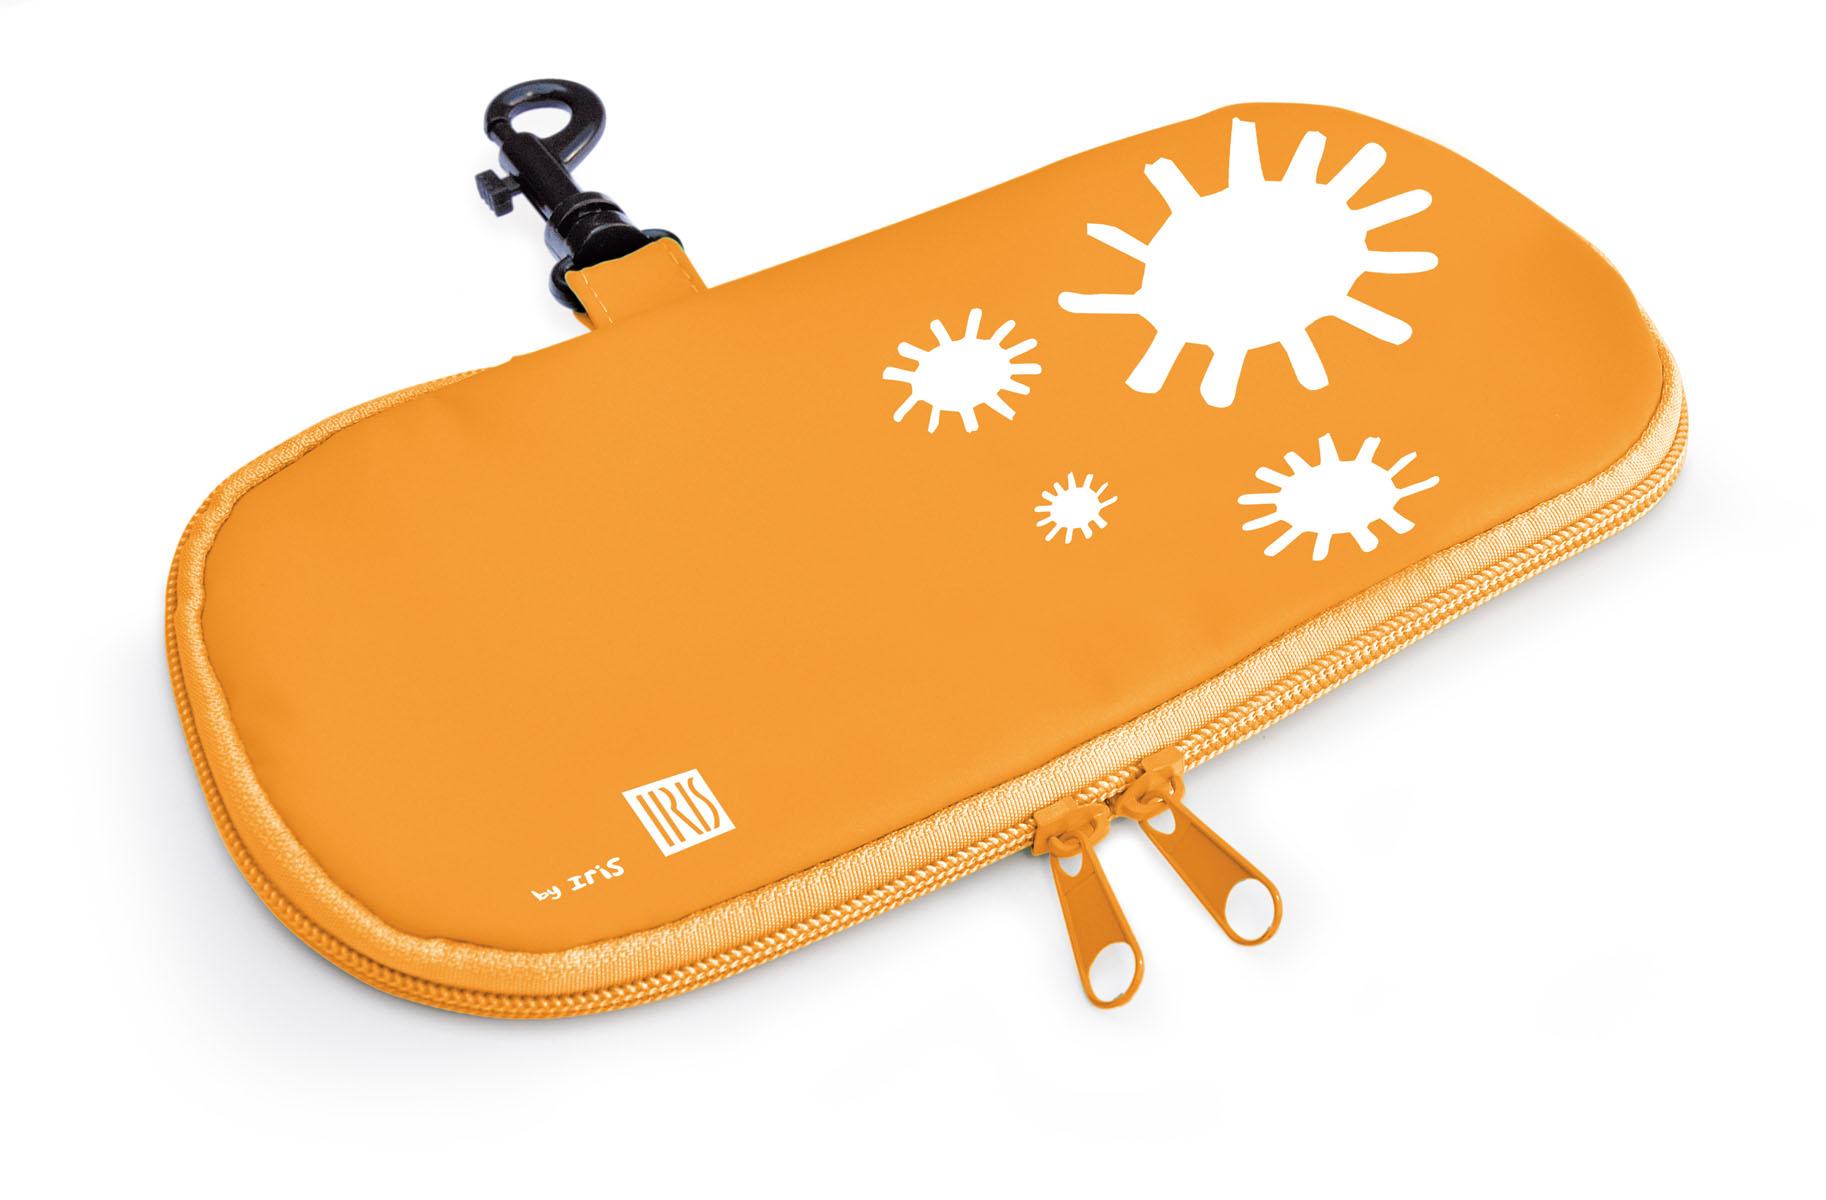 Термобутербродница мягкая Iris Barcelona Kids, цвет: оранжевый, 24 см х 12 см термоланчбокс iris barcelona nano cooler цвет оранжевый